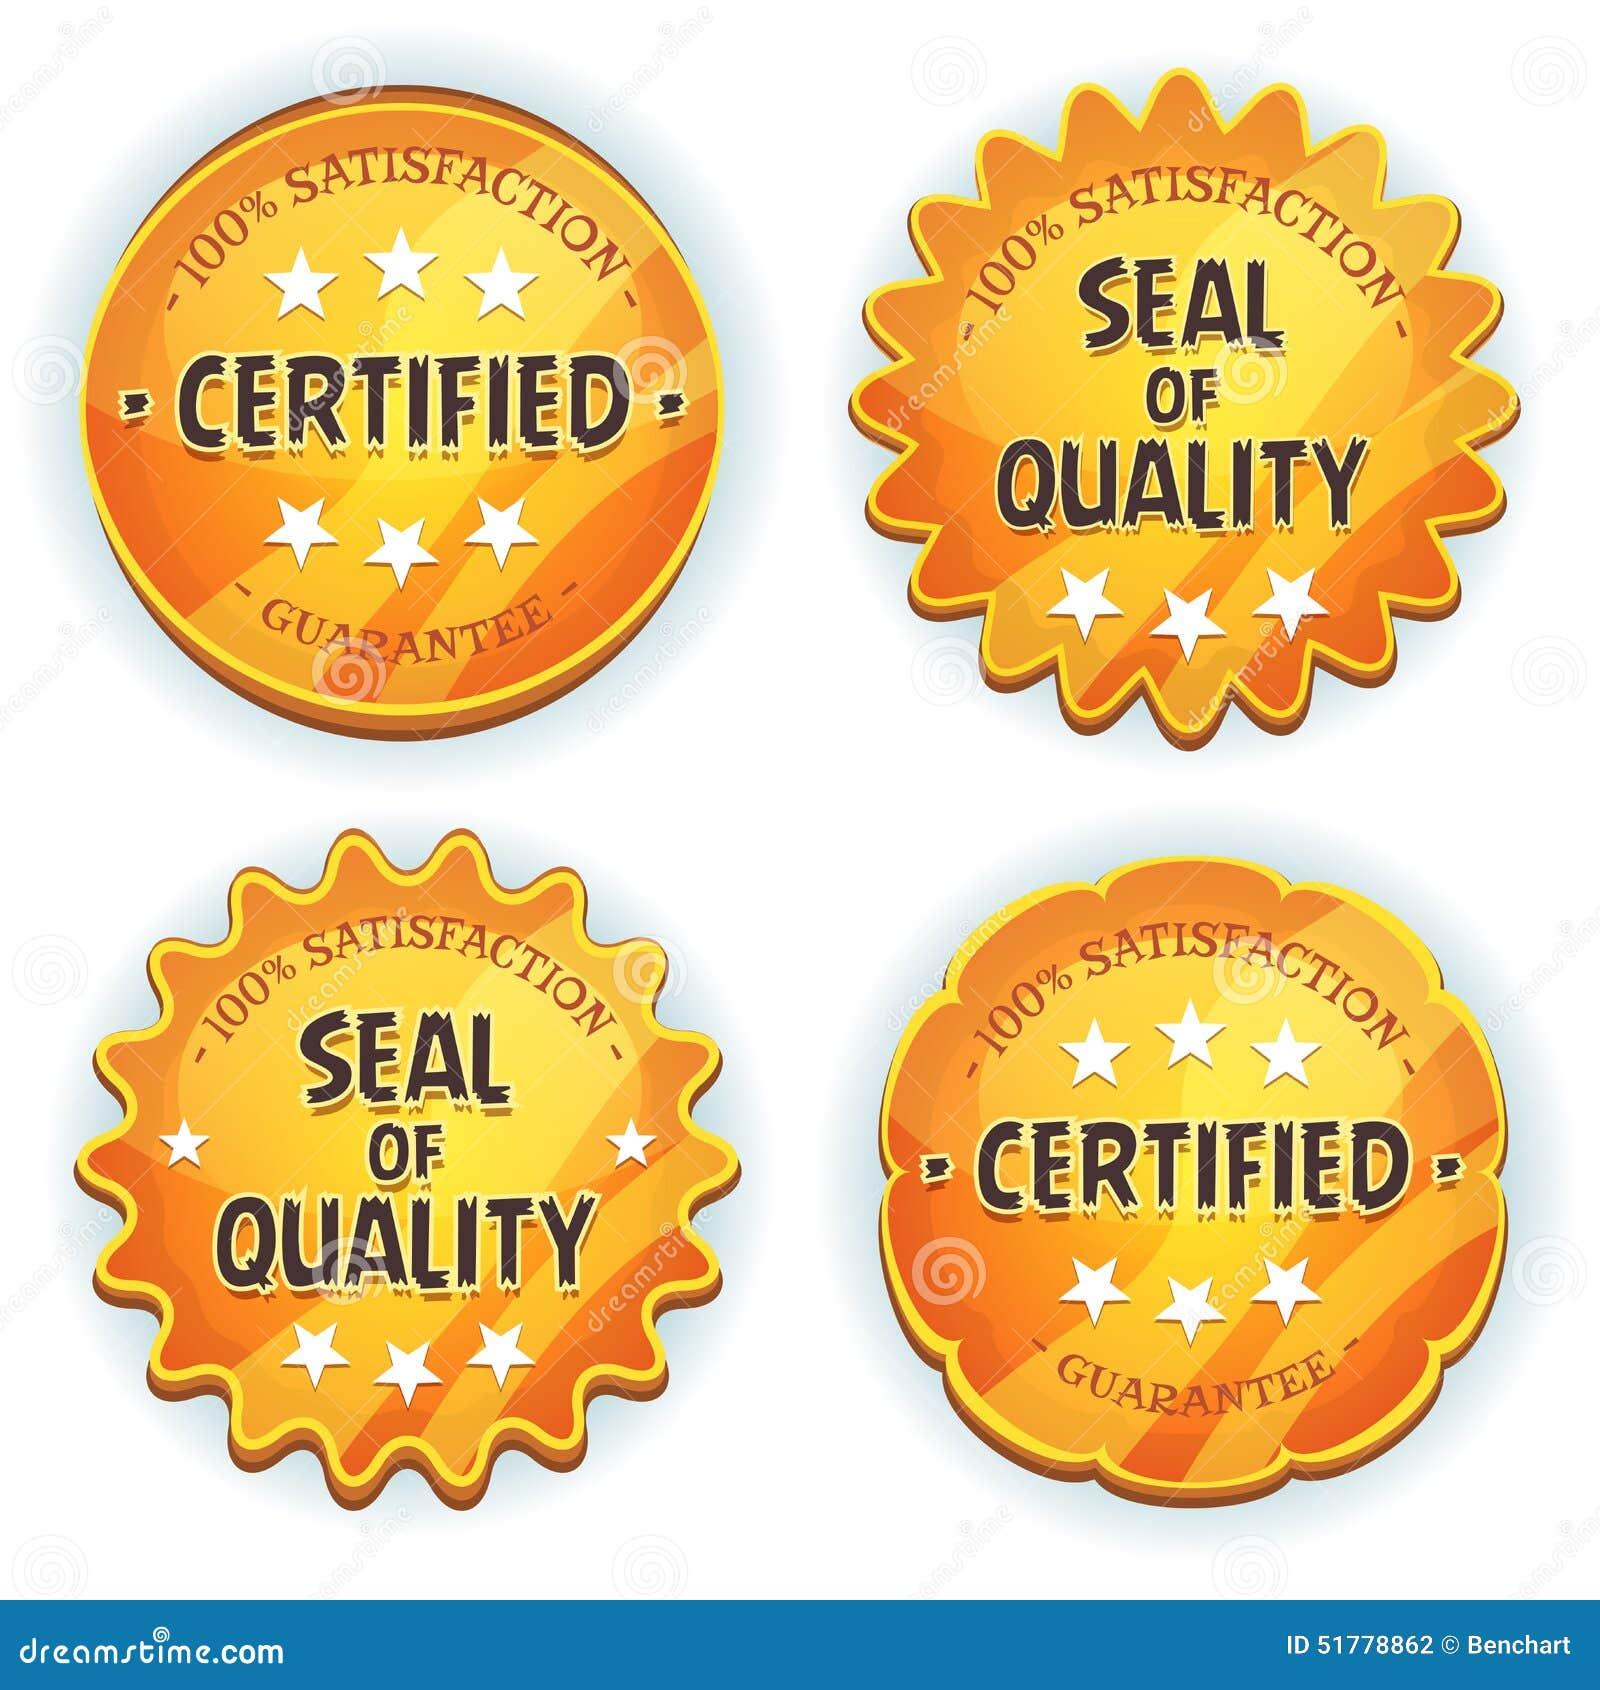 Image Result For Insurance Premium Stock Illustration Images